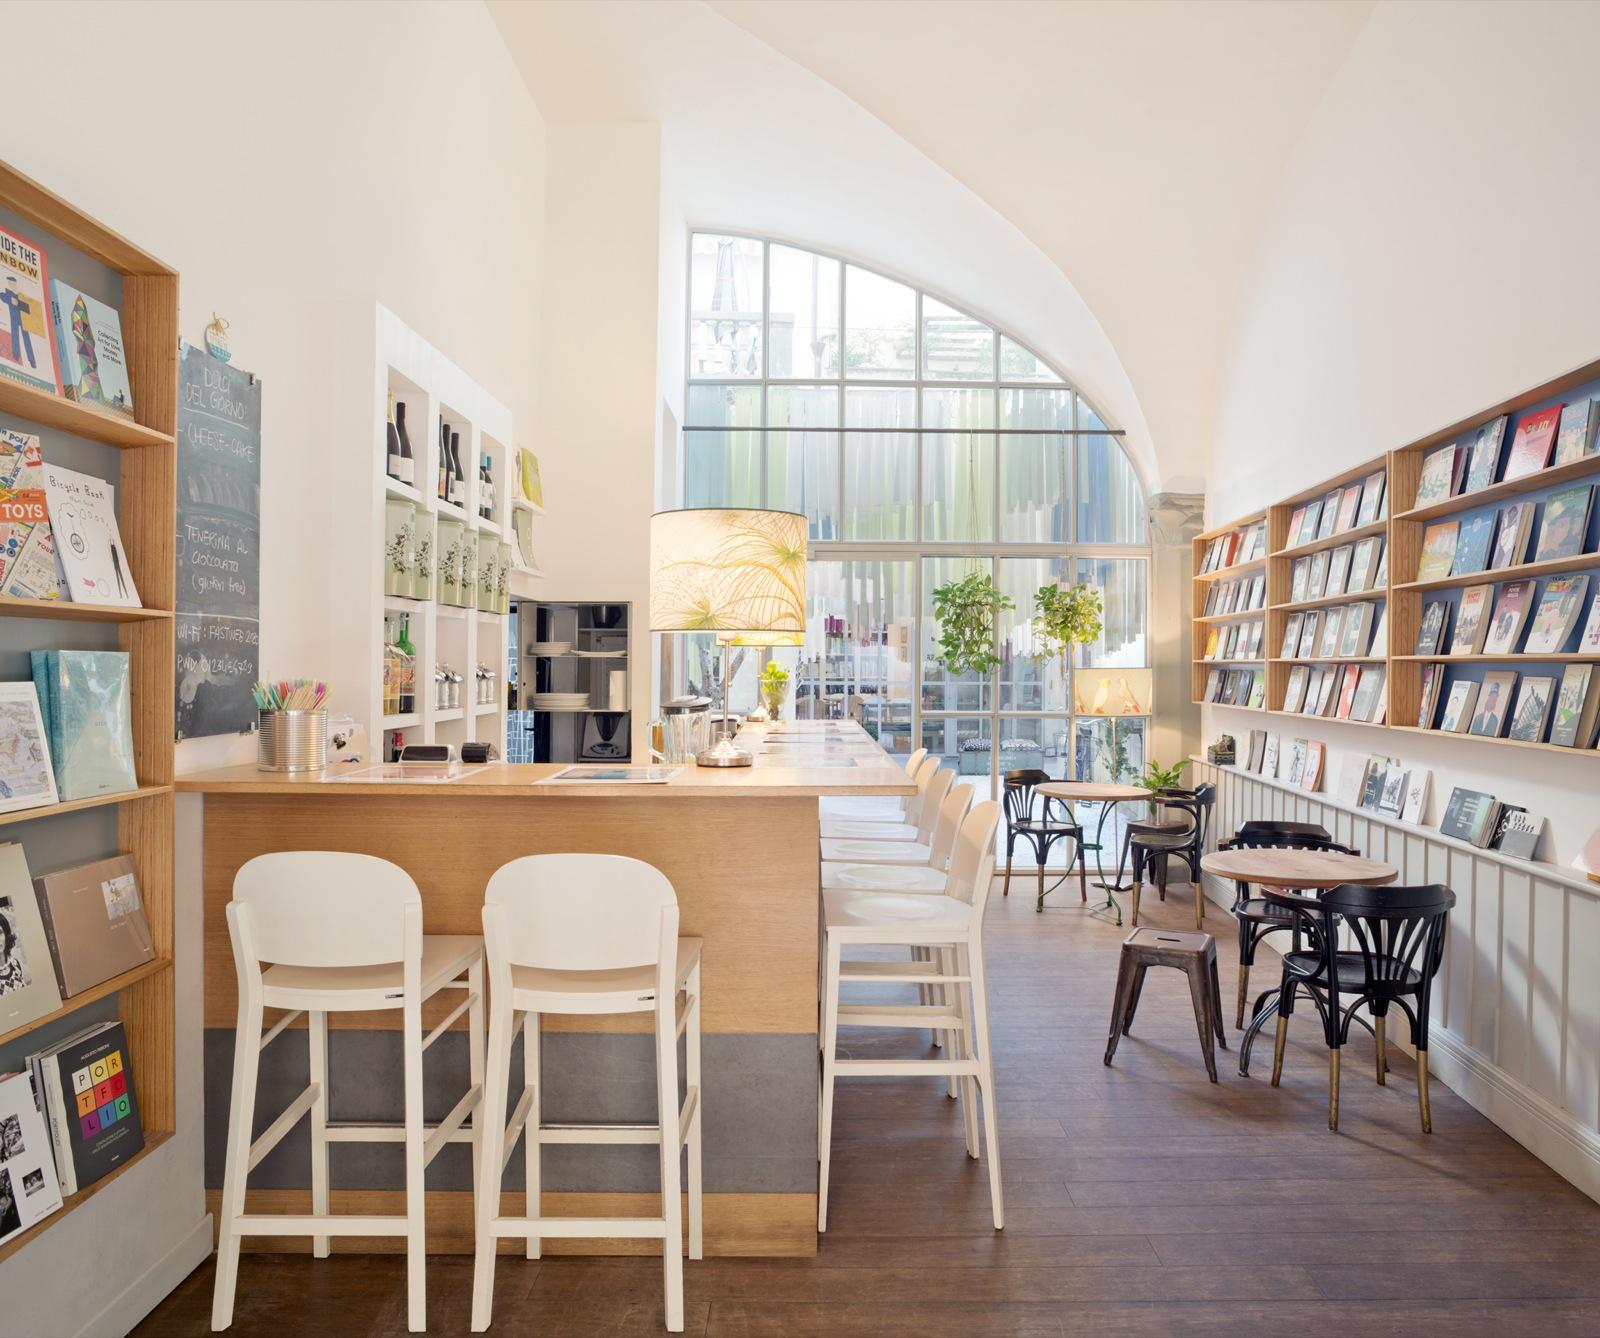 10 Librerie Italiane Indipendenti Geca Industrie Grafiche